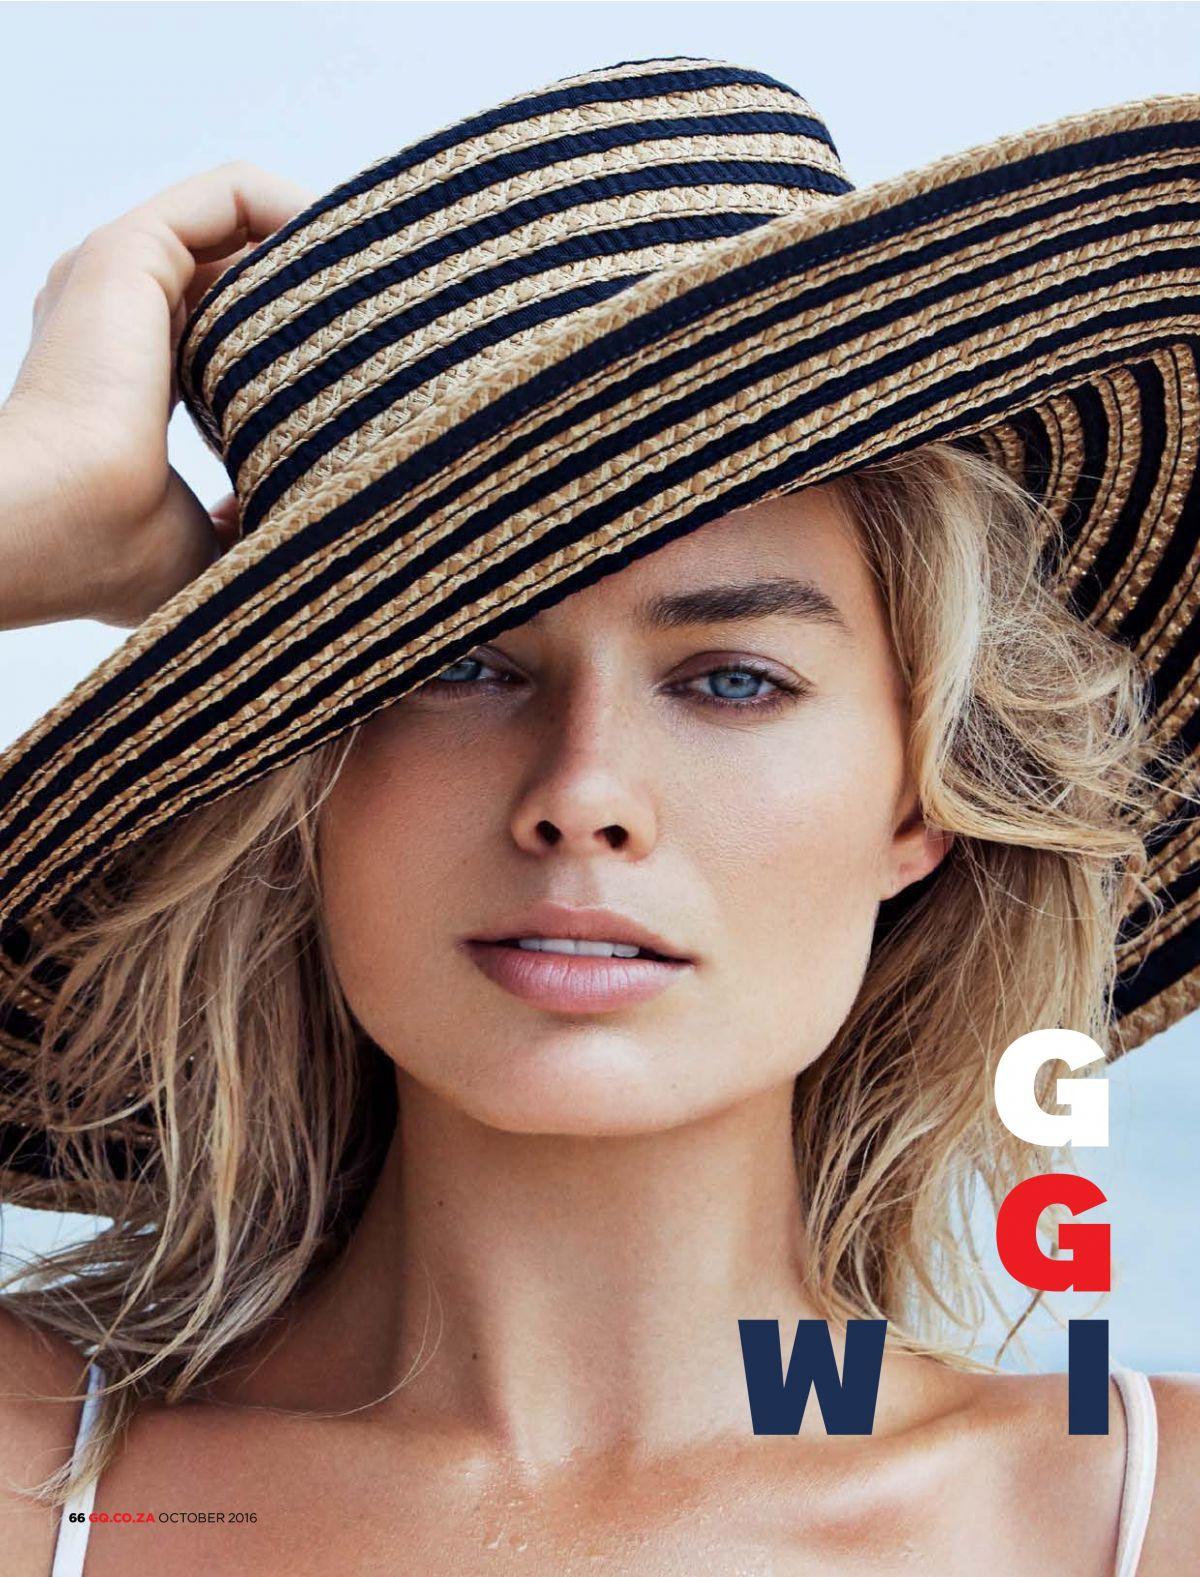 MARGOT ROBBIE in GQ Magazine, South Africa October 2016 Issue